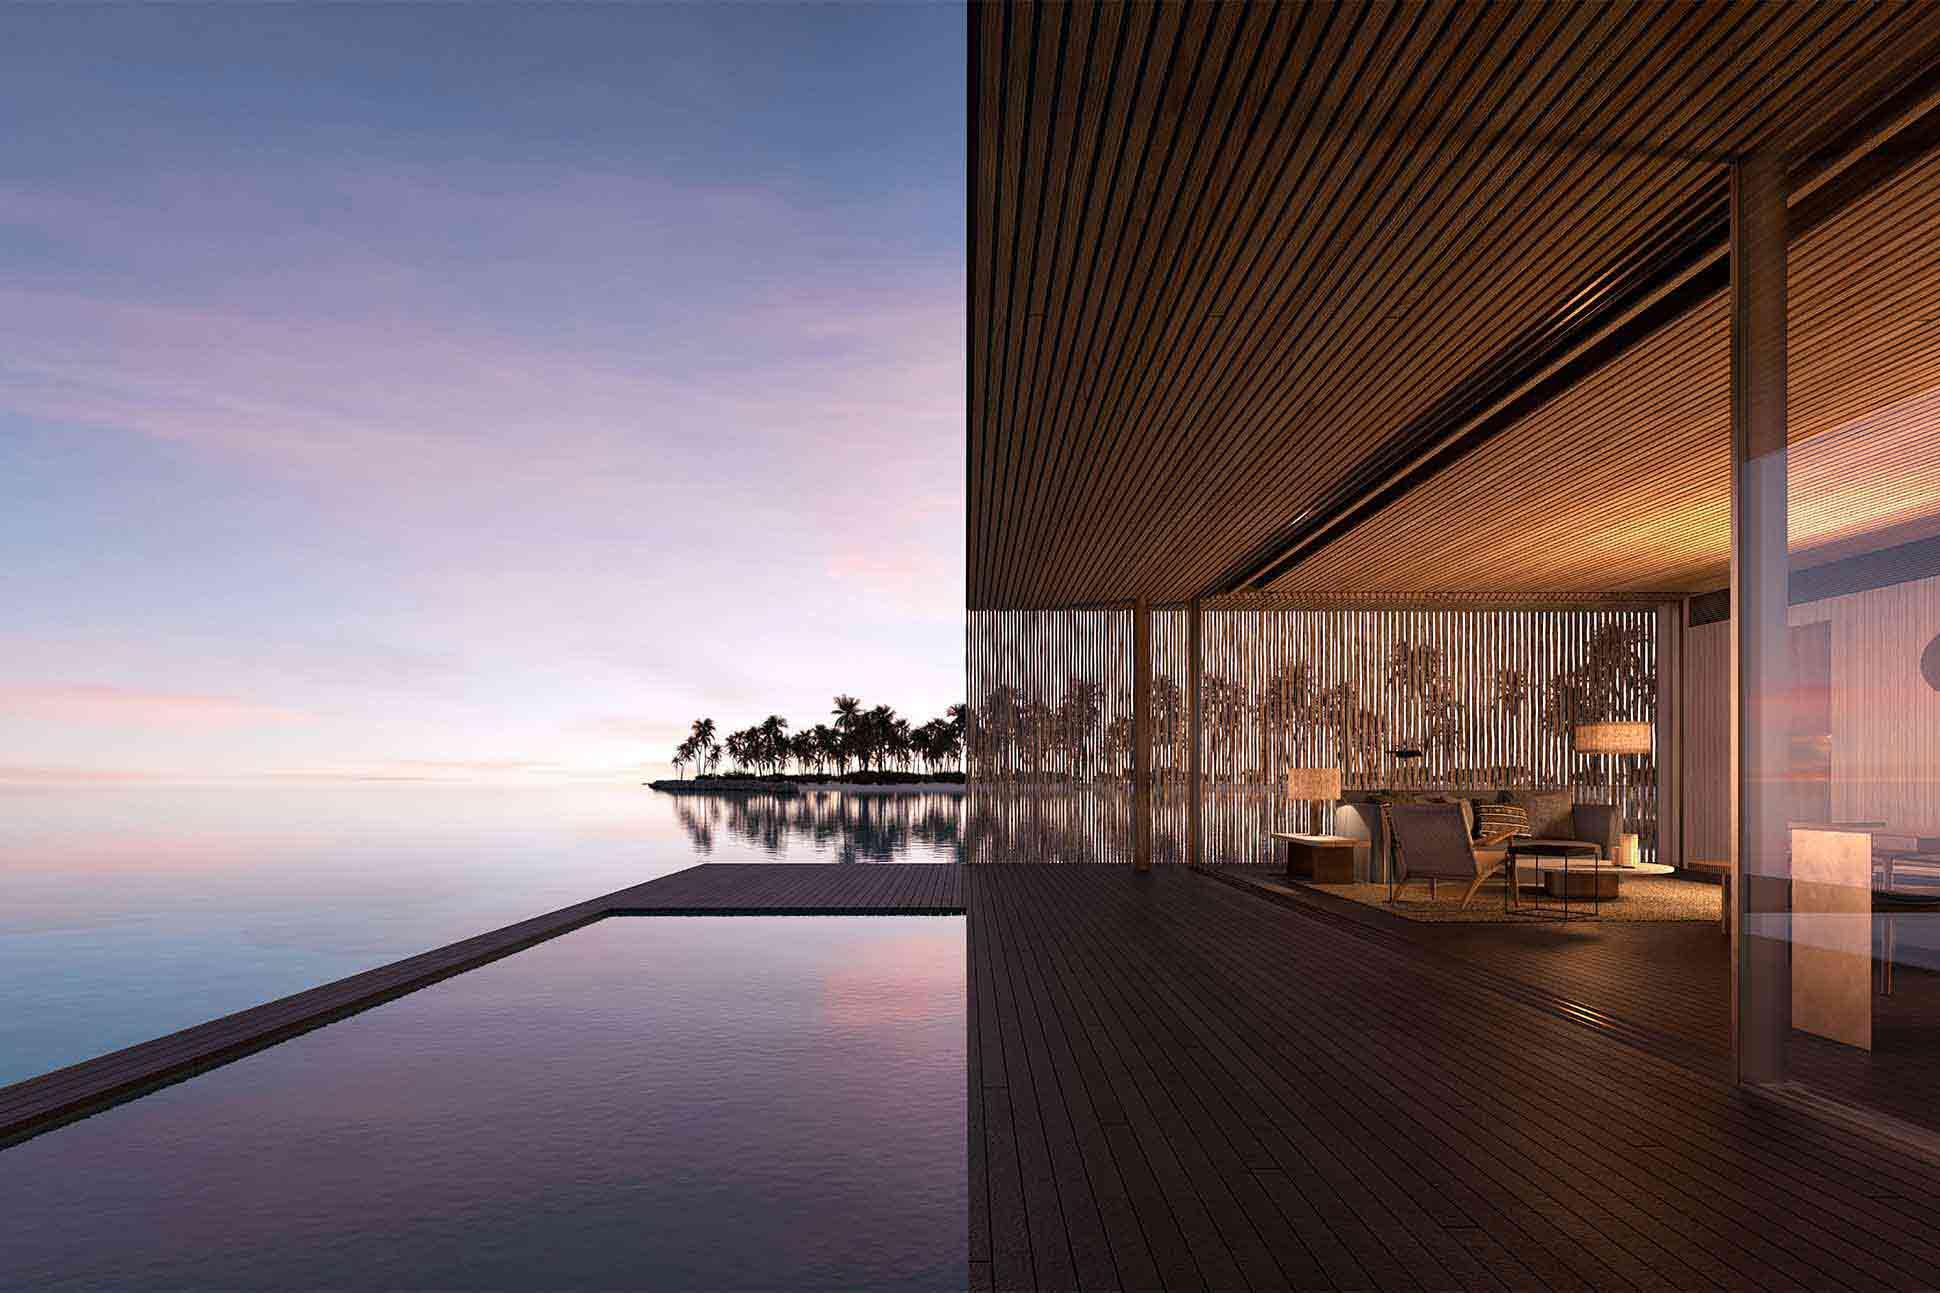 Ocean view suite at Patina Maldives in the Fari Islands